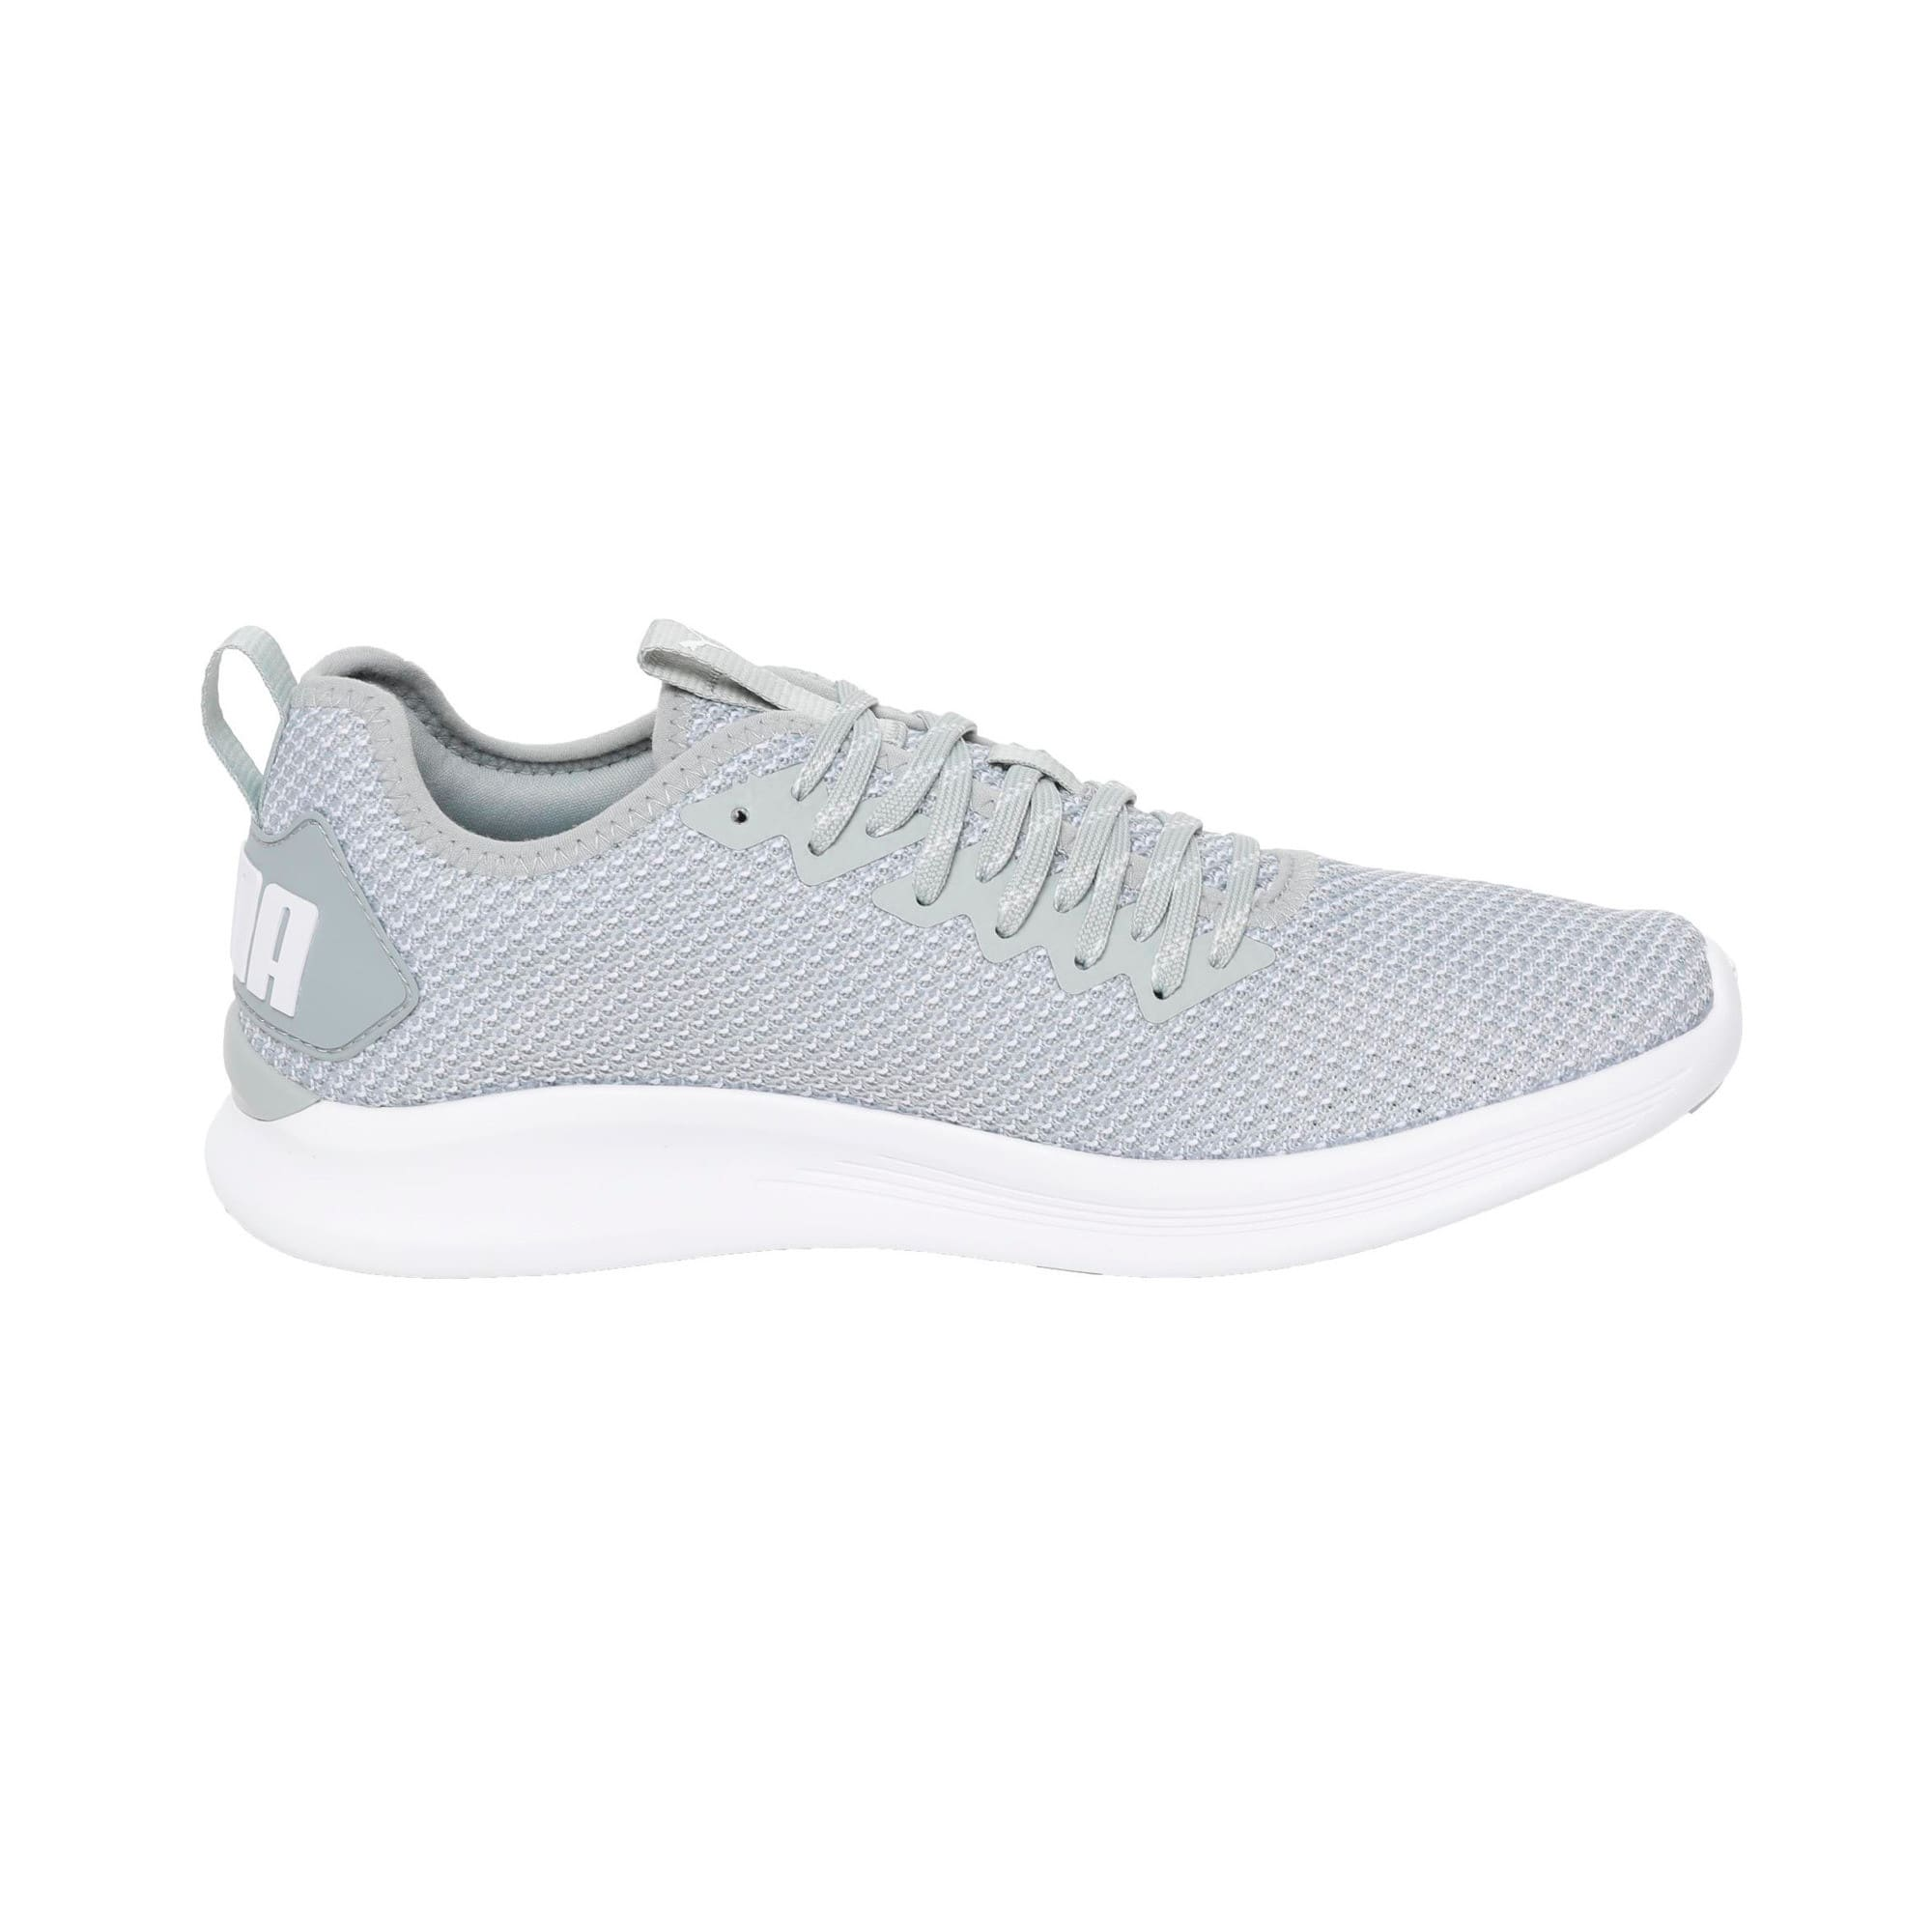 Thumbnail 5 of IGNITE Flash FS Men's Running Shoes, Quarry-Puma White, medium-IND